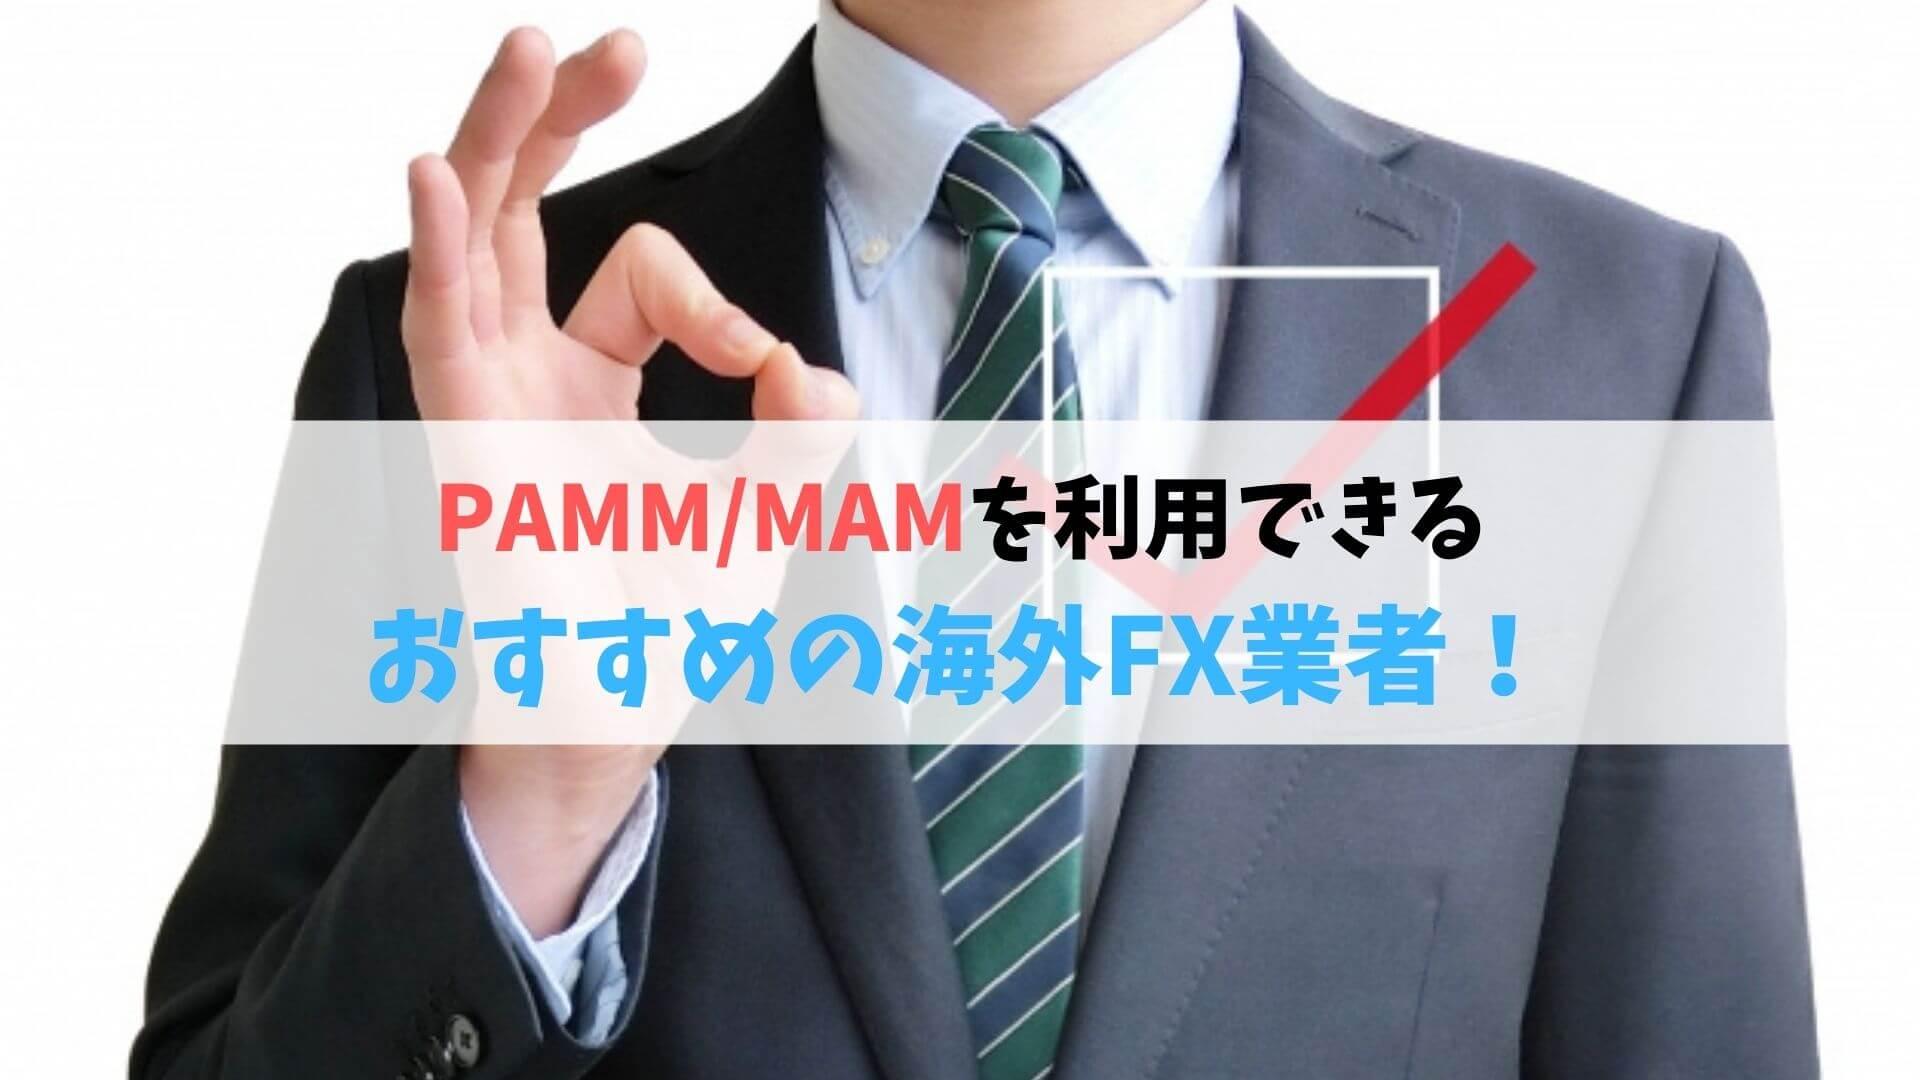 PAM MAM 口座